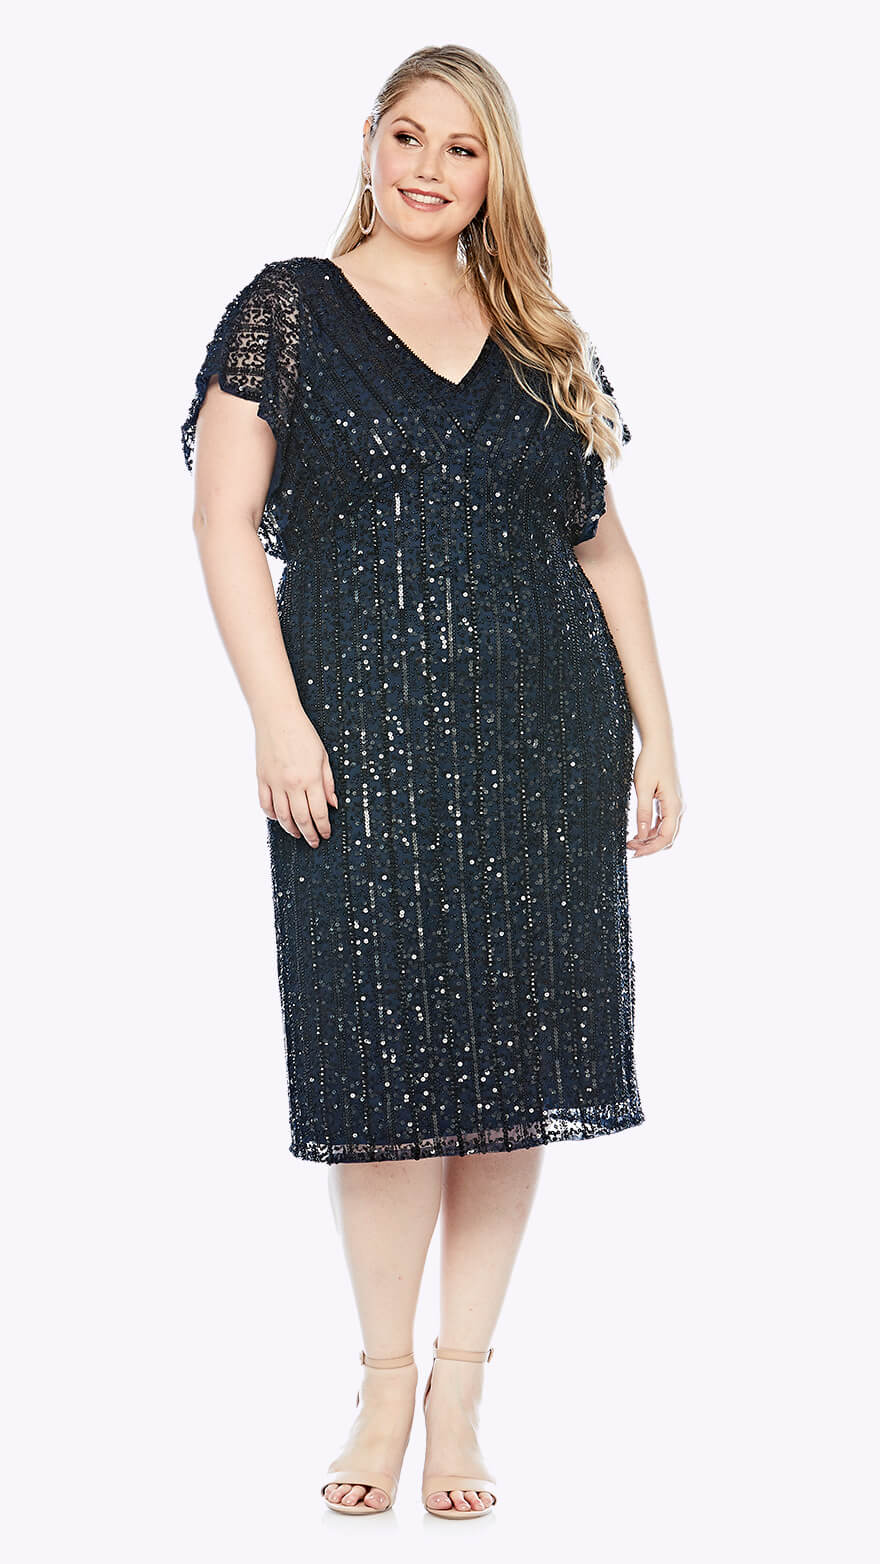 LJ0367 Mid-length beaded dress with soft beaded short sleeve